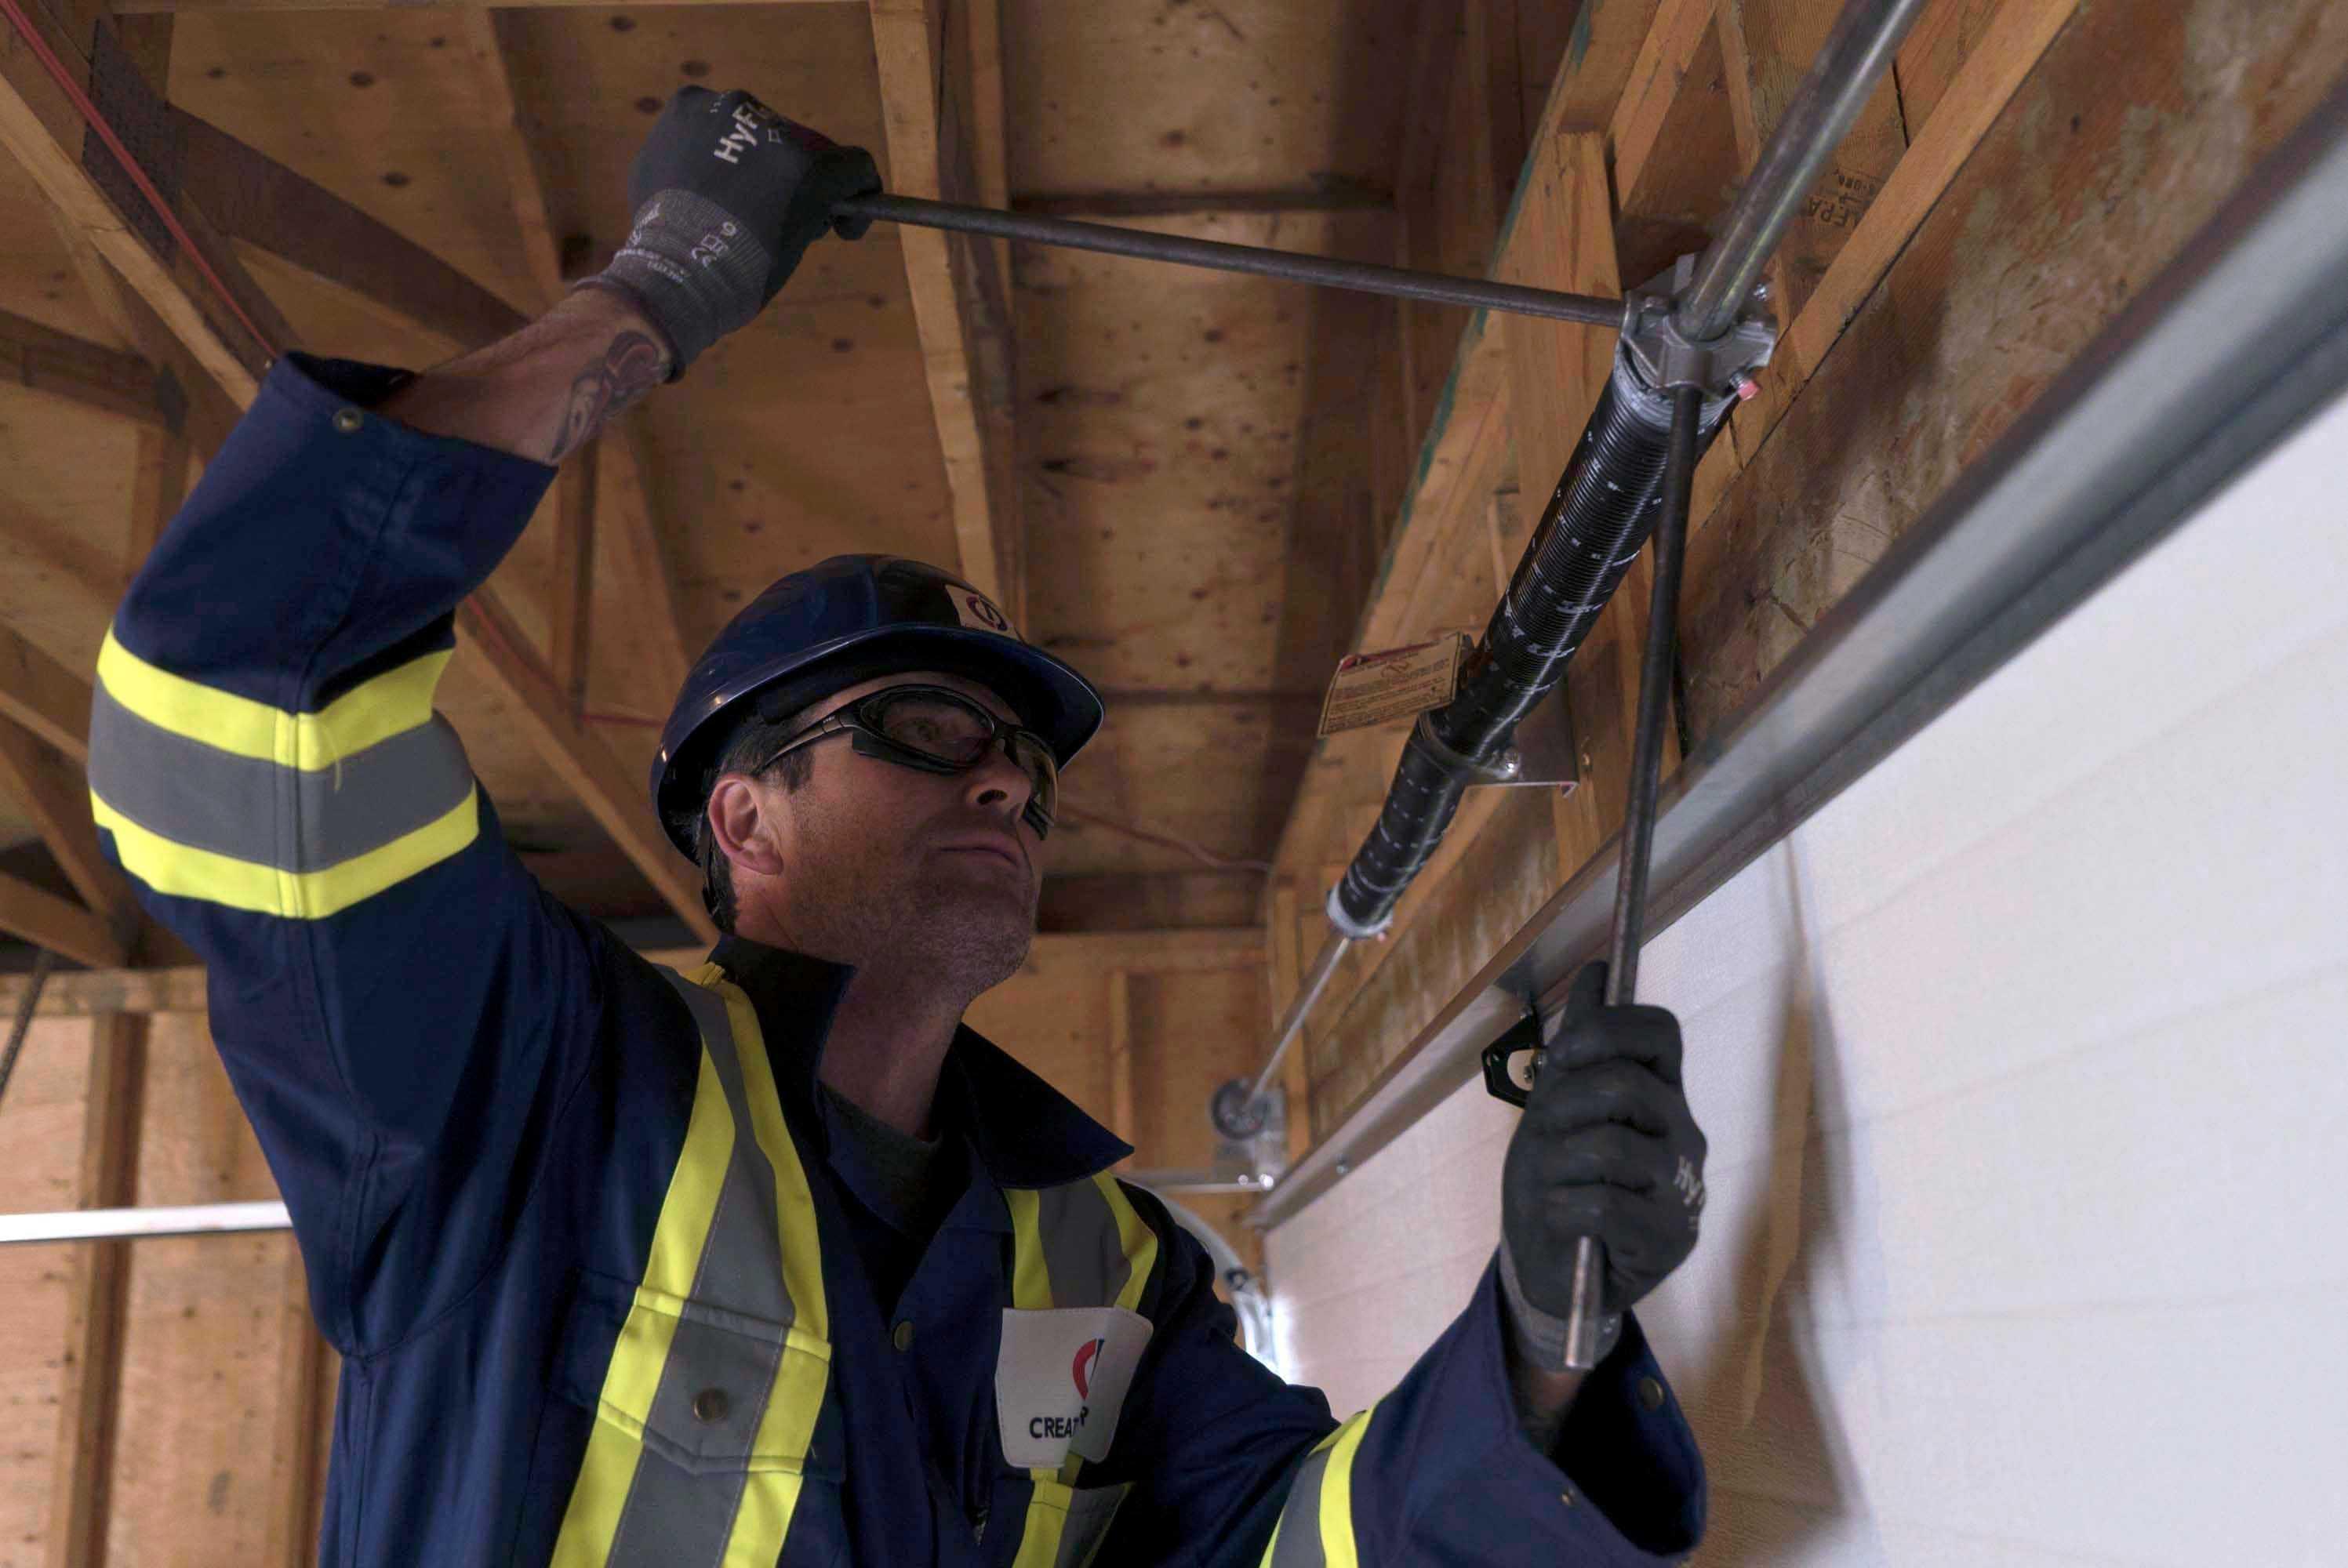 residential-door-service-for-steel-min.jpeg?mtime=20210125104131#asset:22019